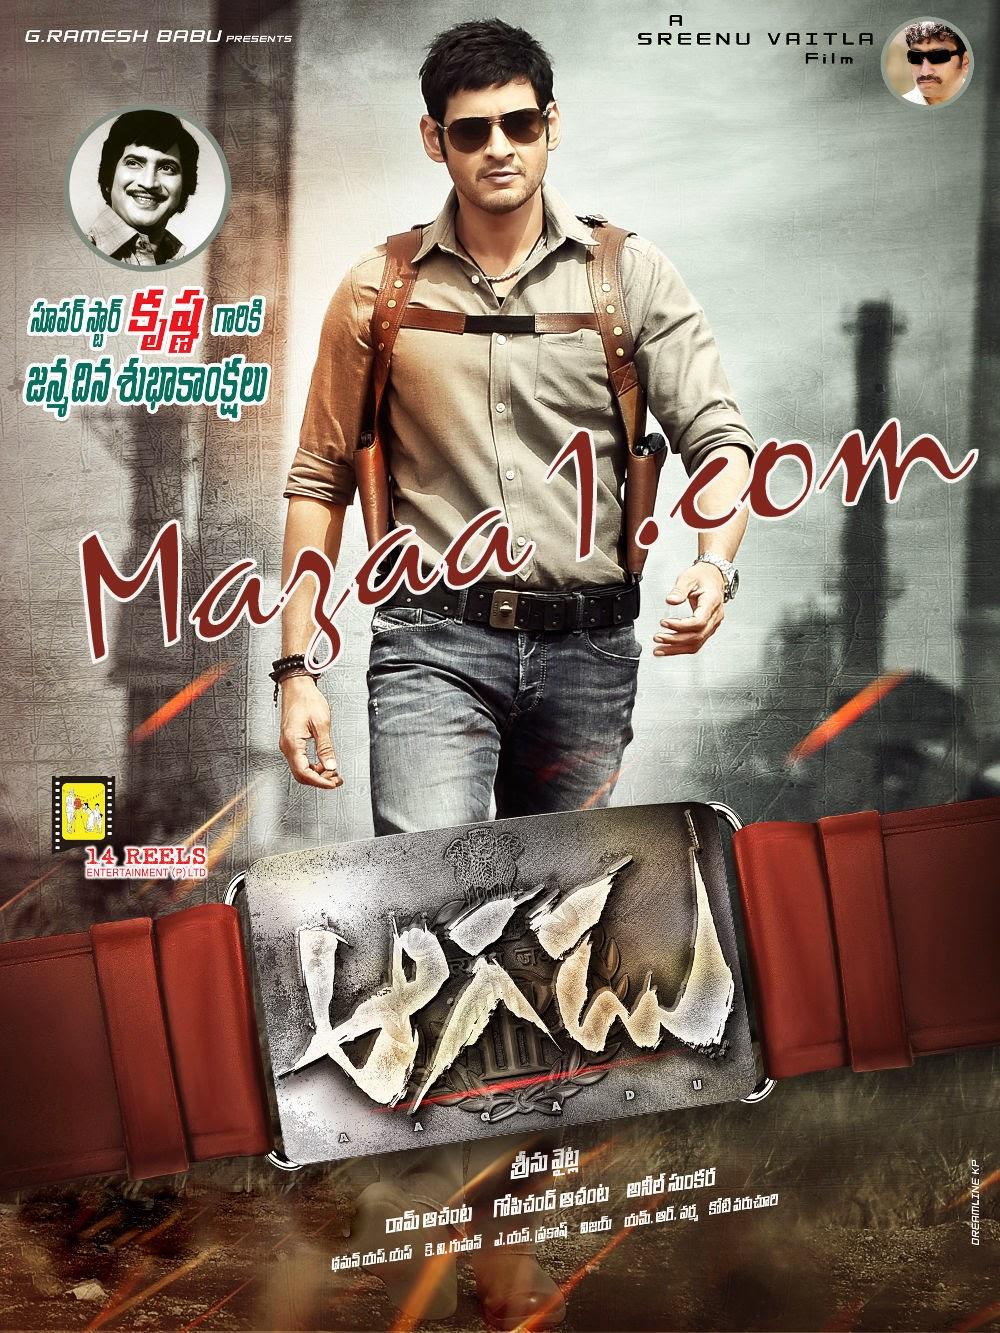 Telugu songs mp3 download audio cd rips-taazasongs | blog about.